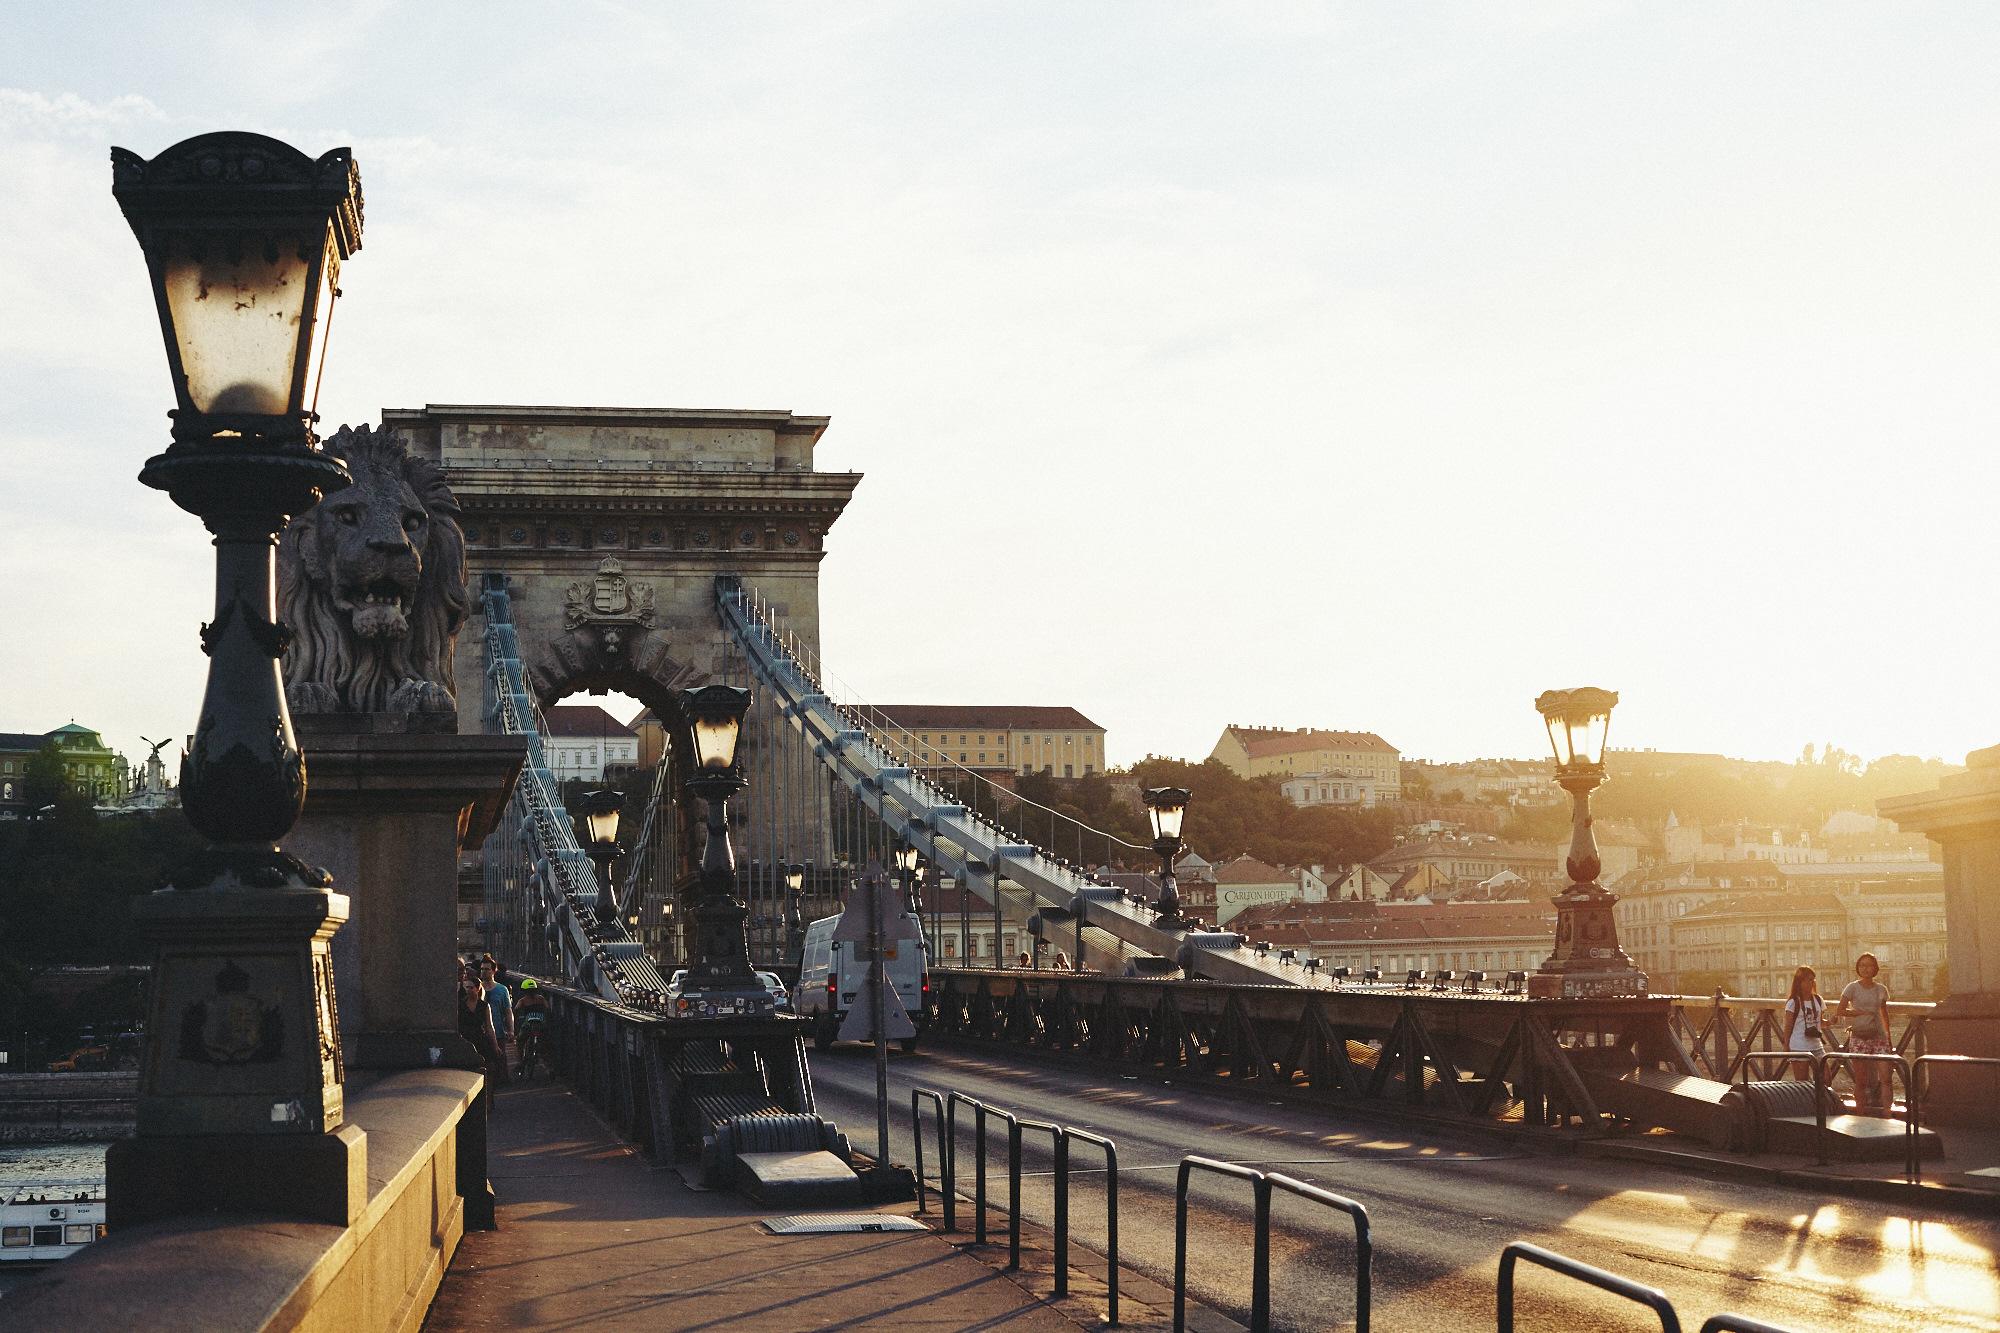 maxmotel_budapest_aug2015_day01_06_danube_bridge_0293